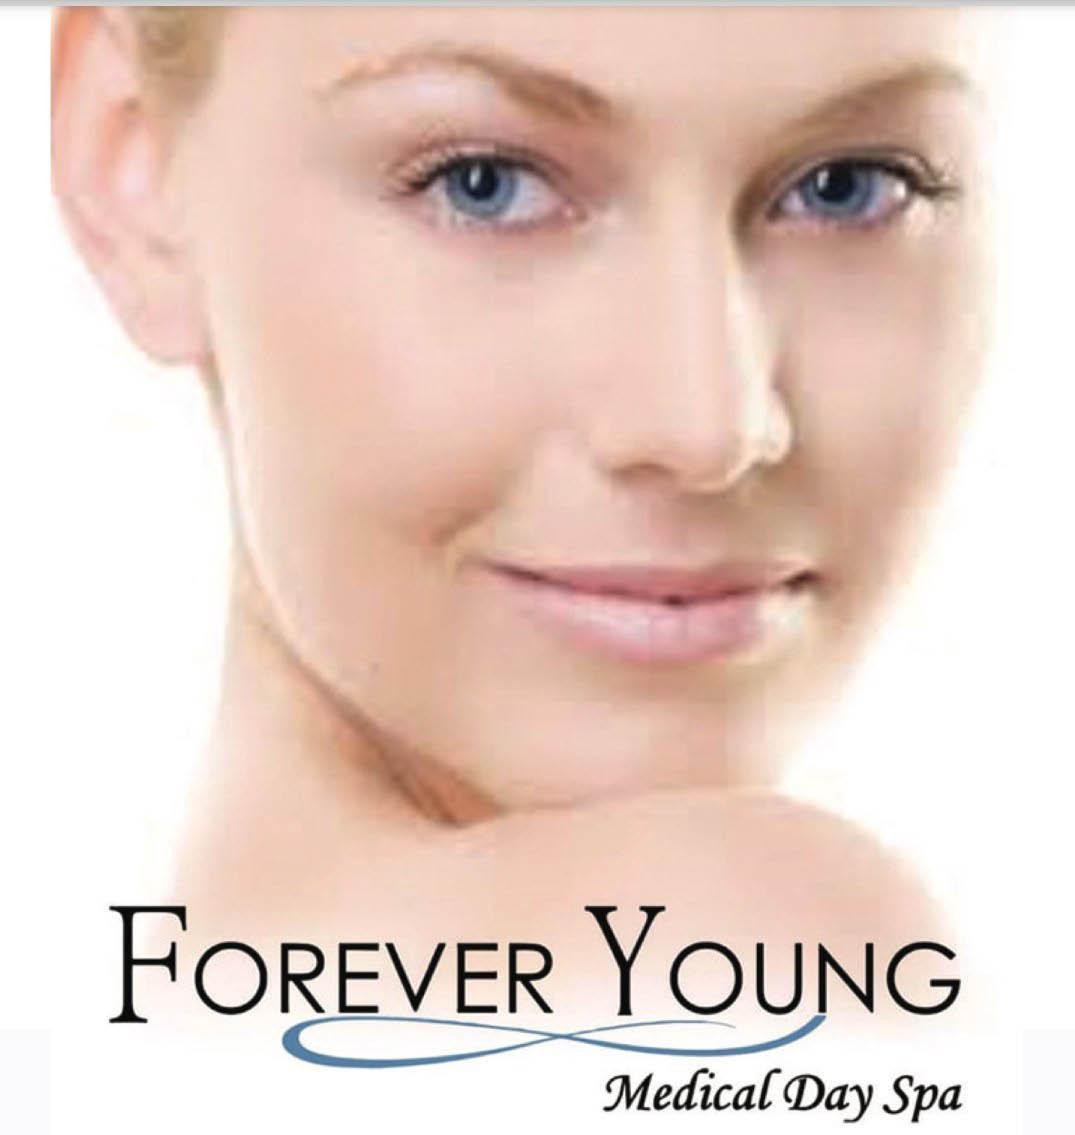 Perfect professional skin care regimen coupons.